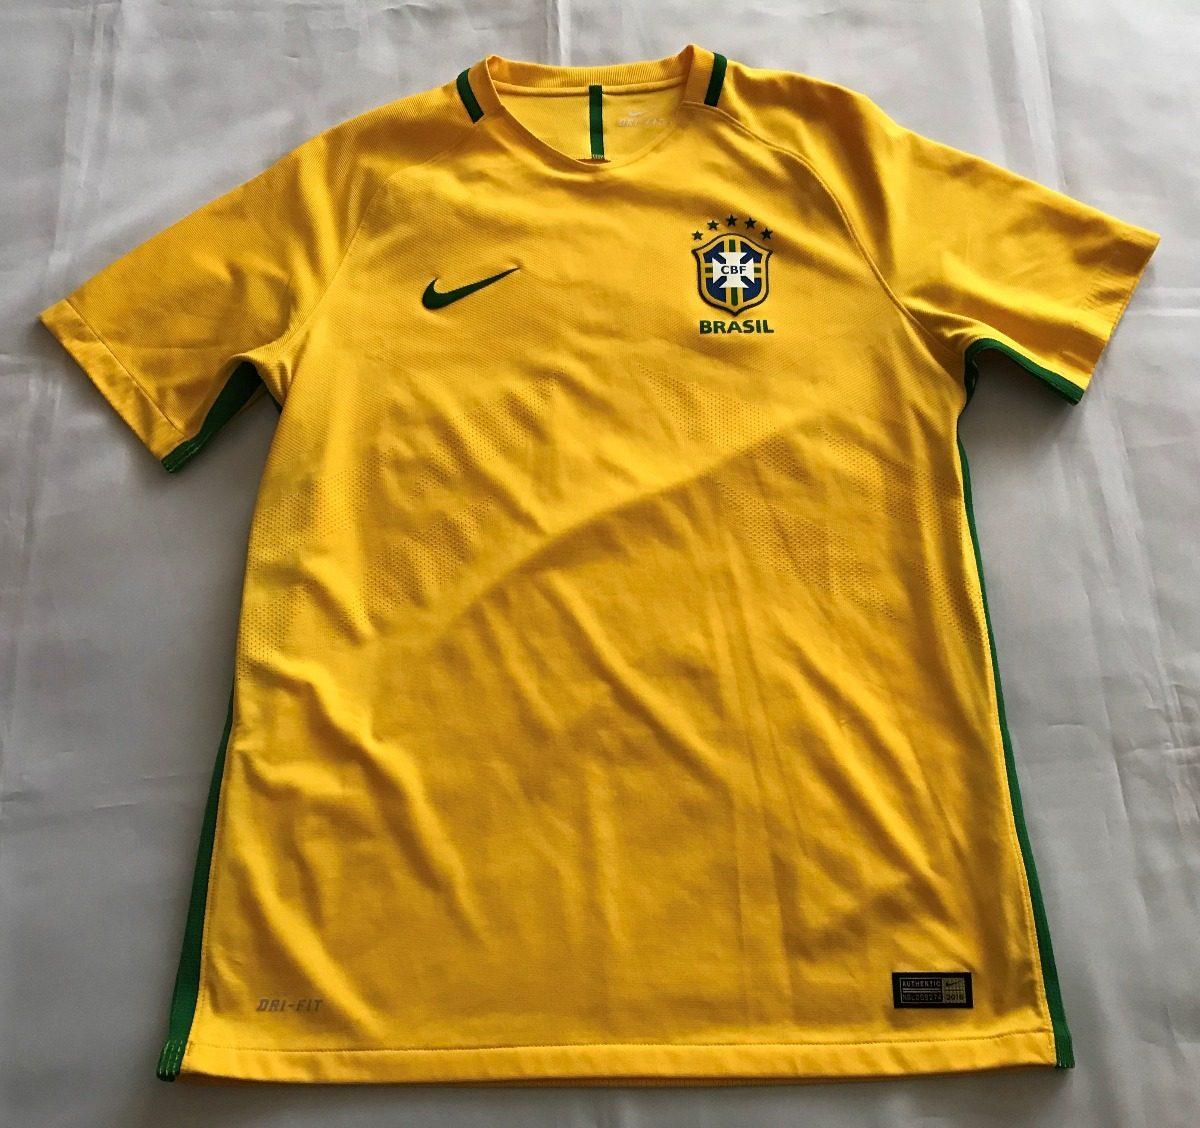 big sale a26b2 e1b51 Jersey Selección De Brasil Nike Original Neymar Versión Juga - $ 1,399.00